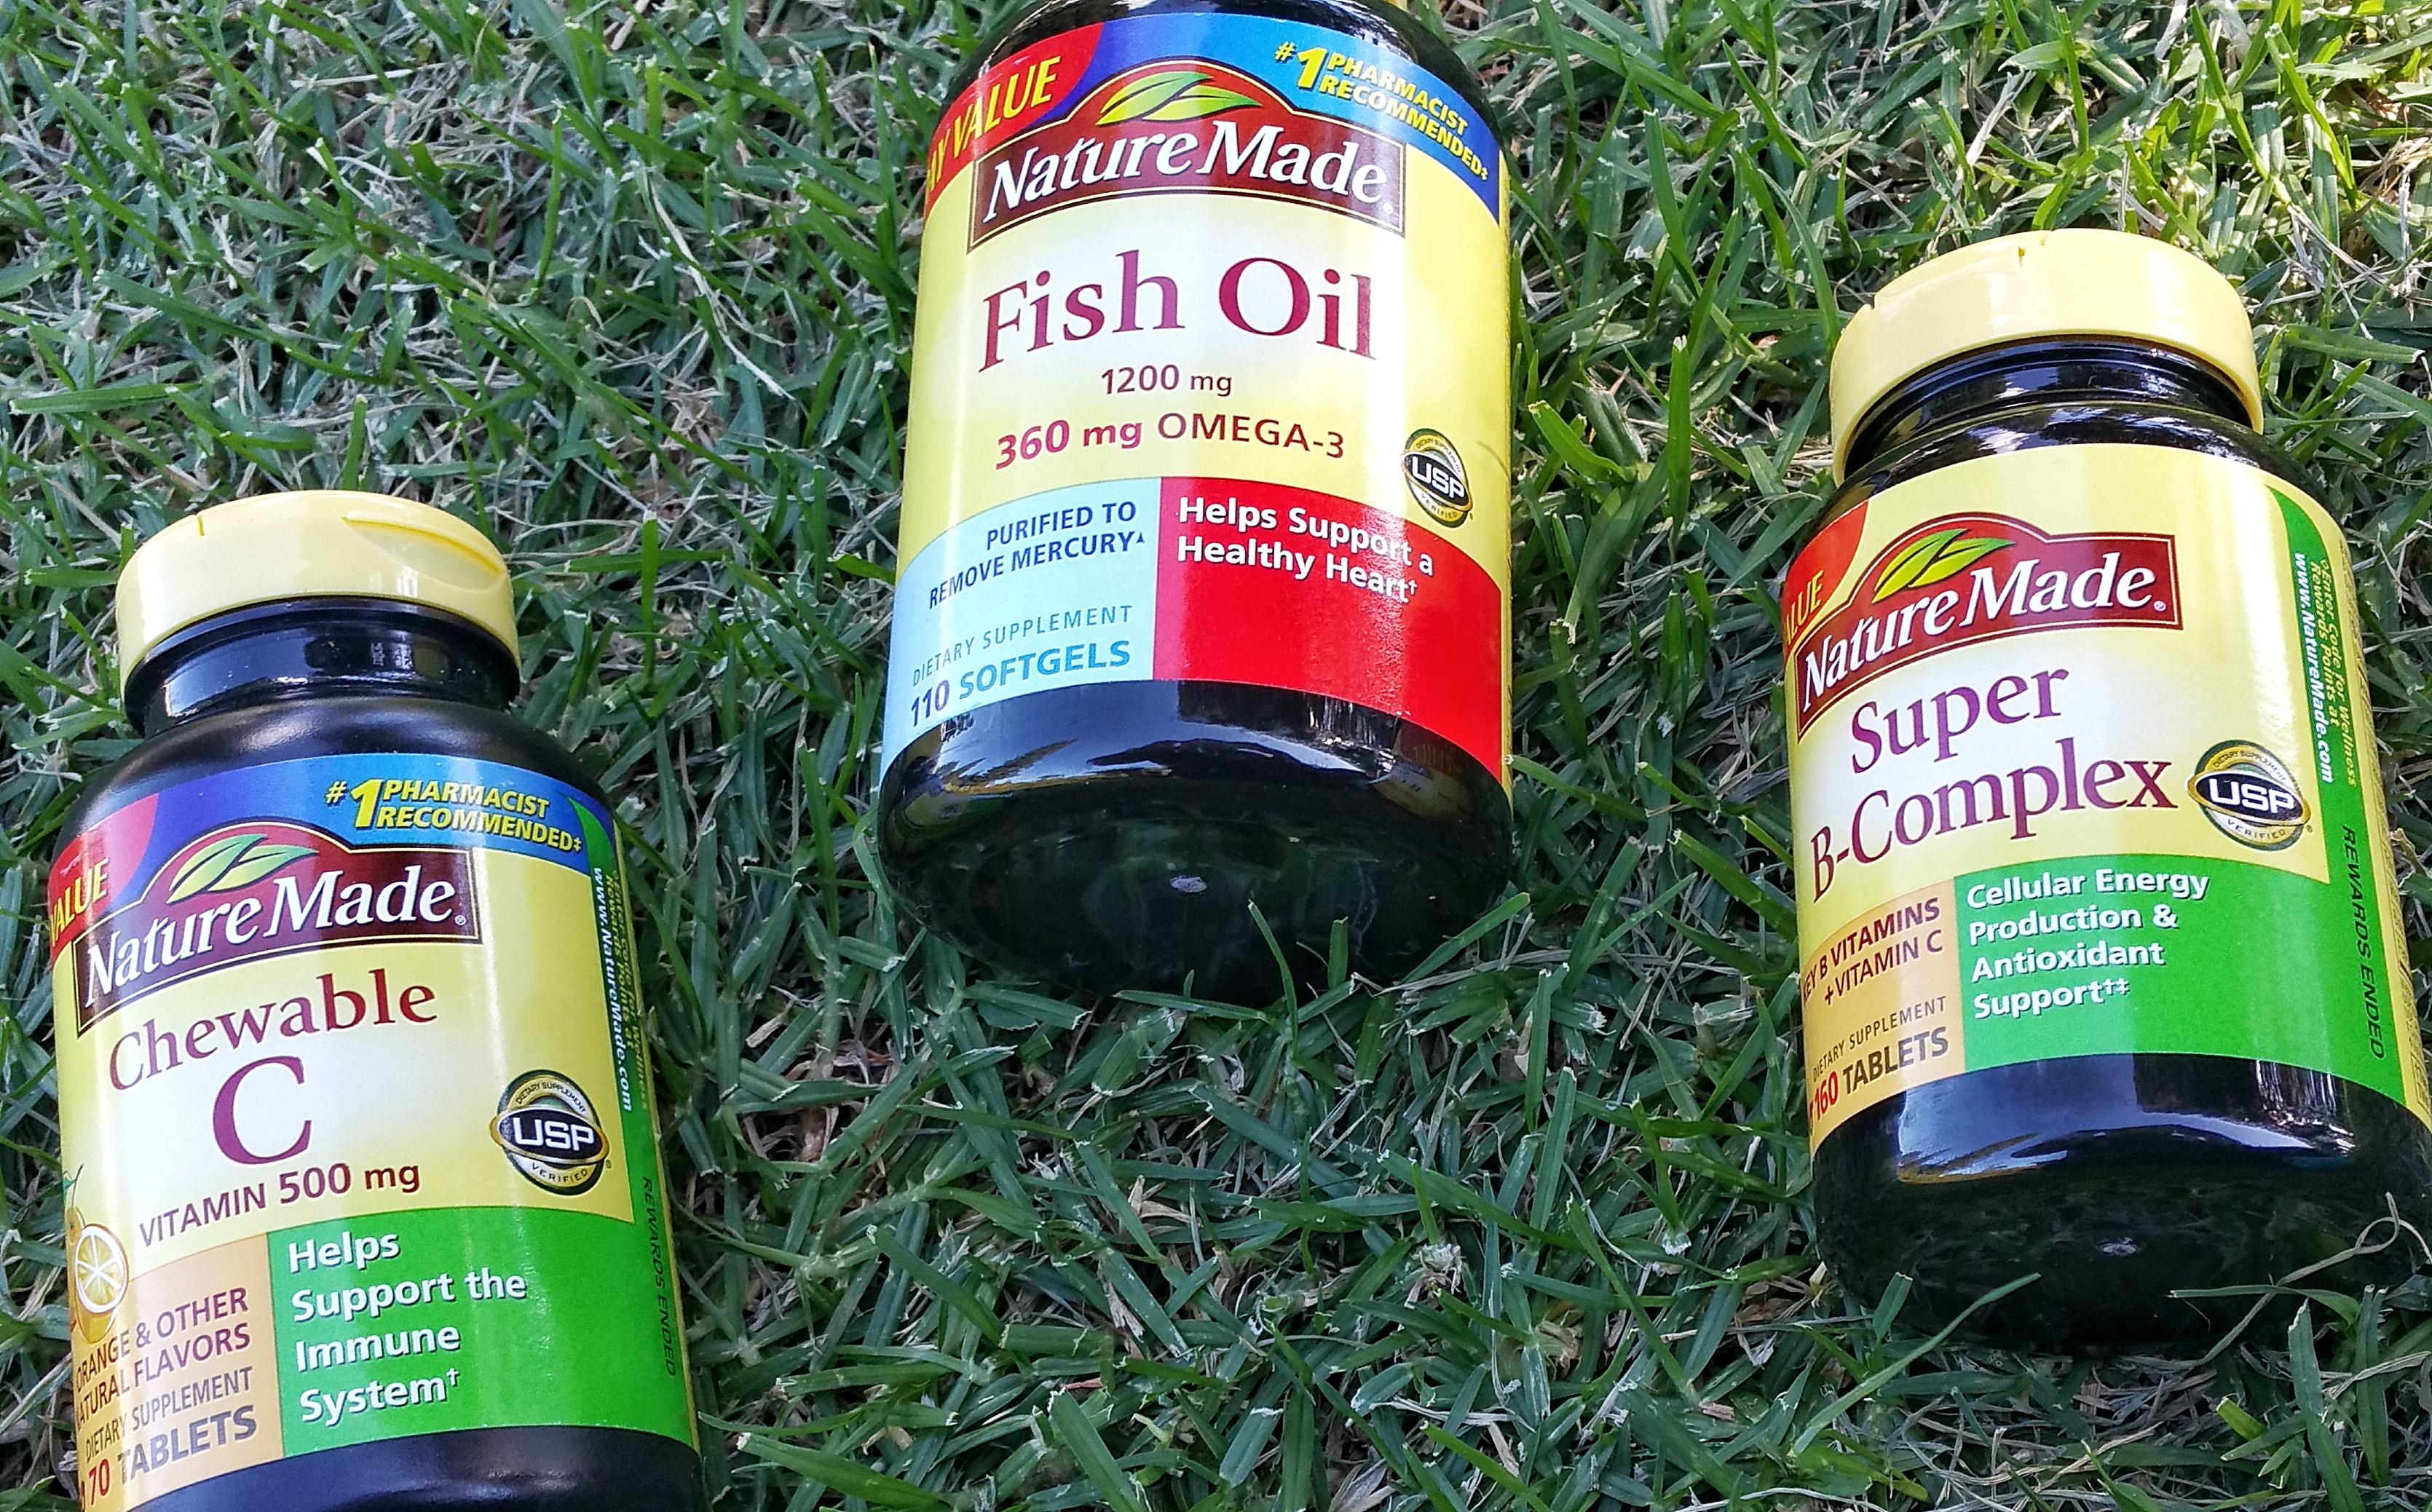 Nature Made, health, wellness, vitamins, Walmart, fish oil vitamins, chewable vitamin c, super b complex, Nature Made at Walmart, review, healthy,